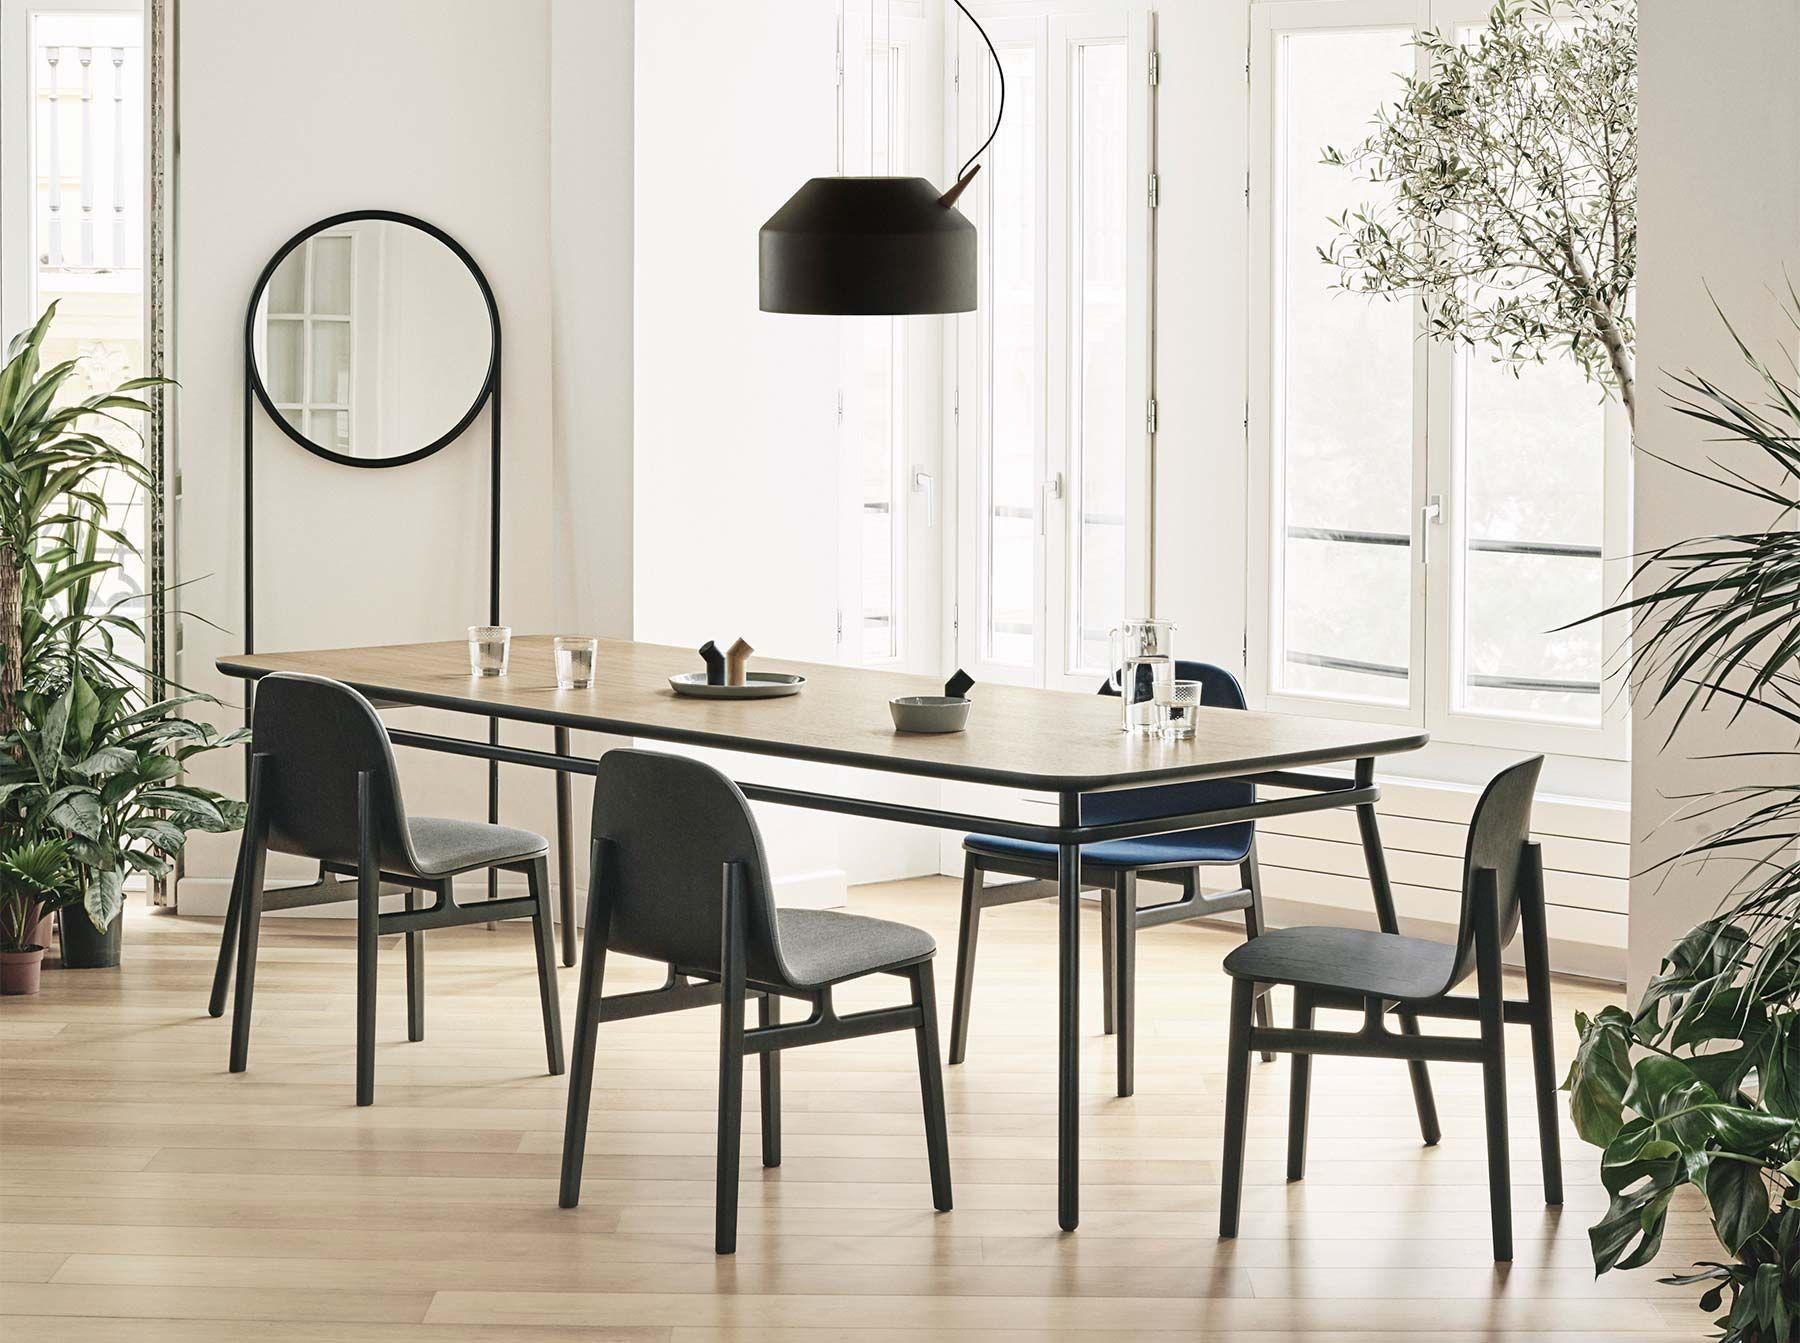 Lasso Table Omelette Iratzoki Lizaso Furniture Pinterest  # Muebles Uriarte